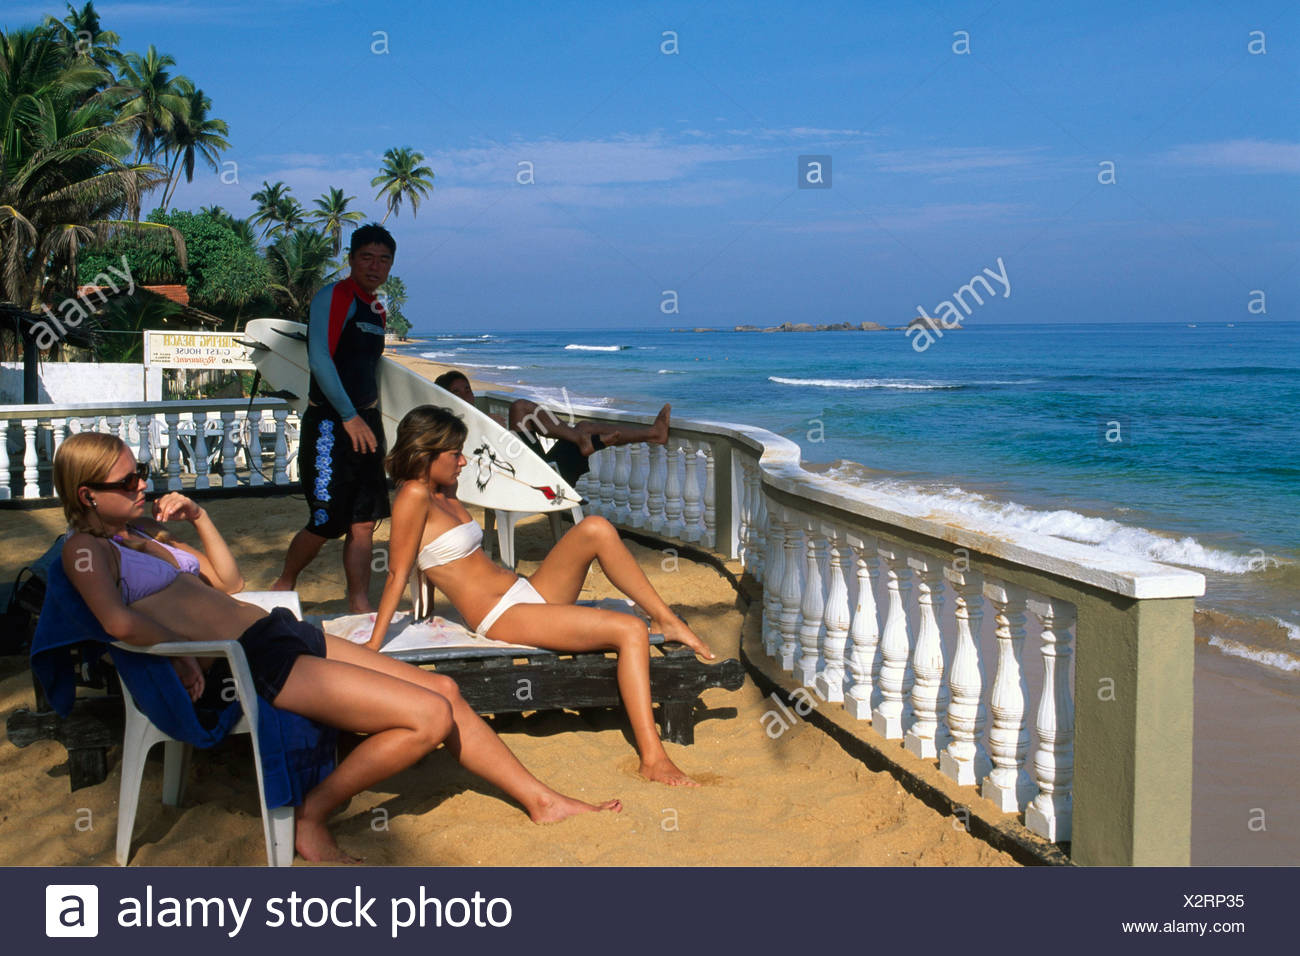 Surfers and sunbathers at Wewala Beach, Sri Lanka, South Asia - Stock Image